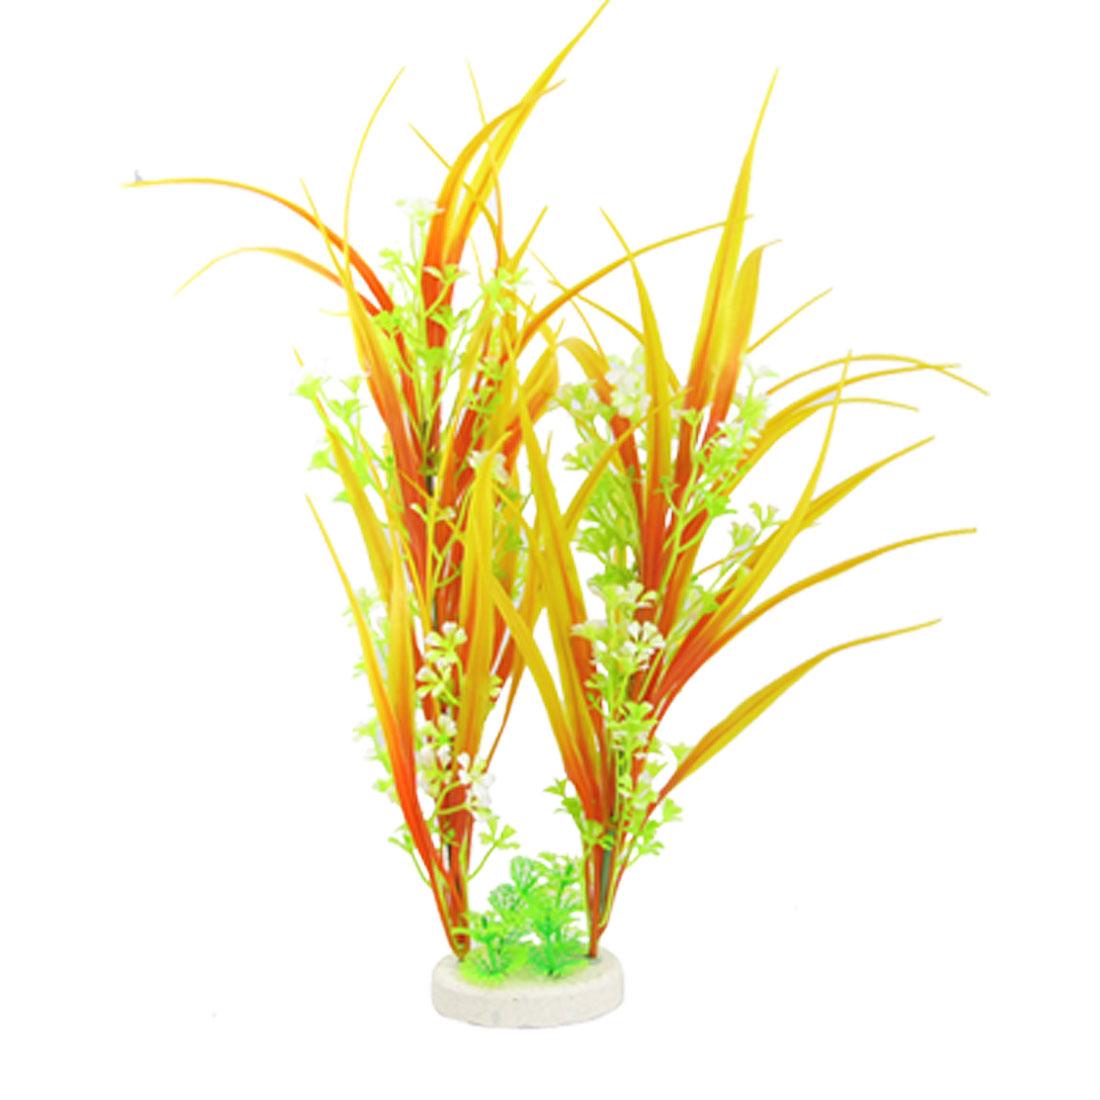 Orange Red Green Plastic Grass Flower Plants Fish Tank Ornament